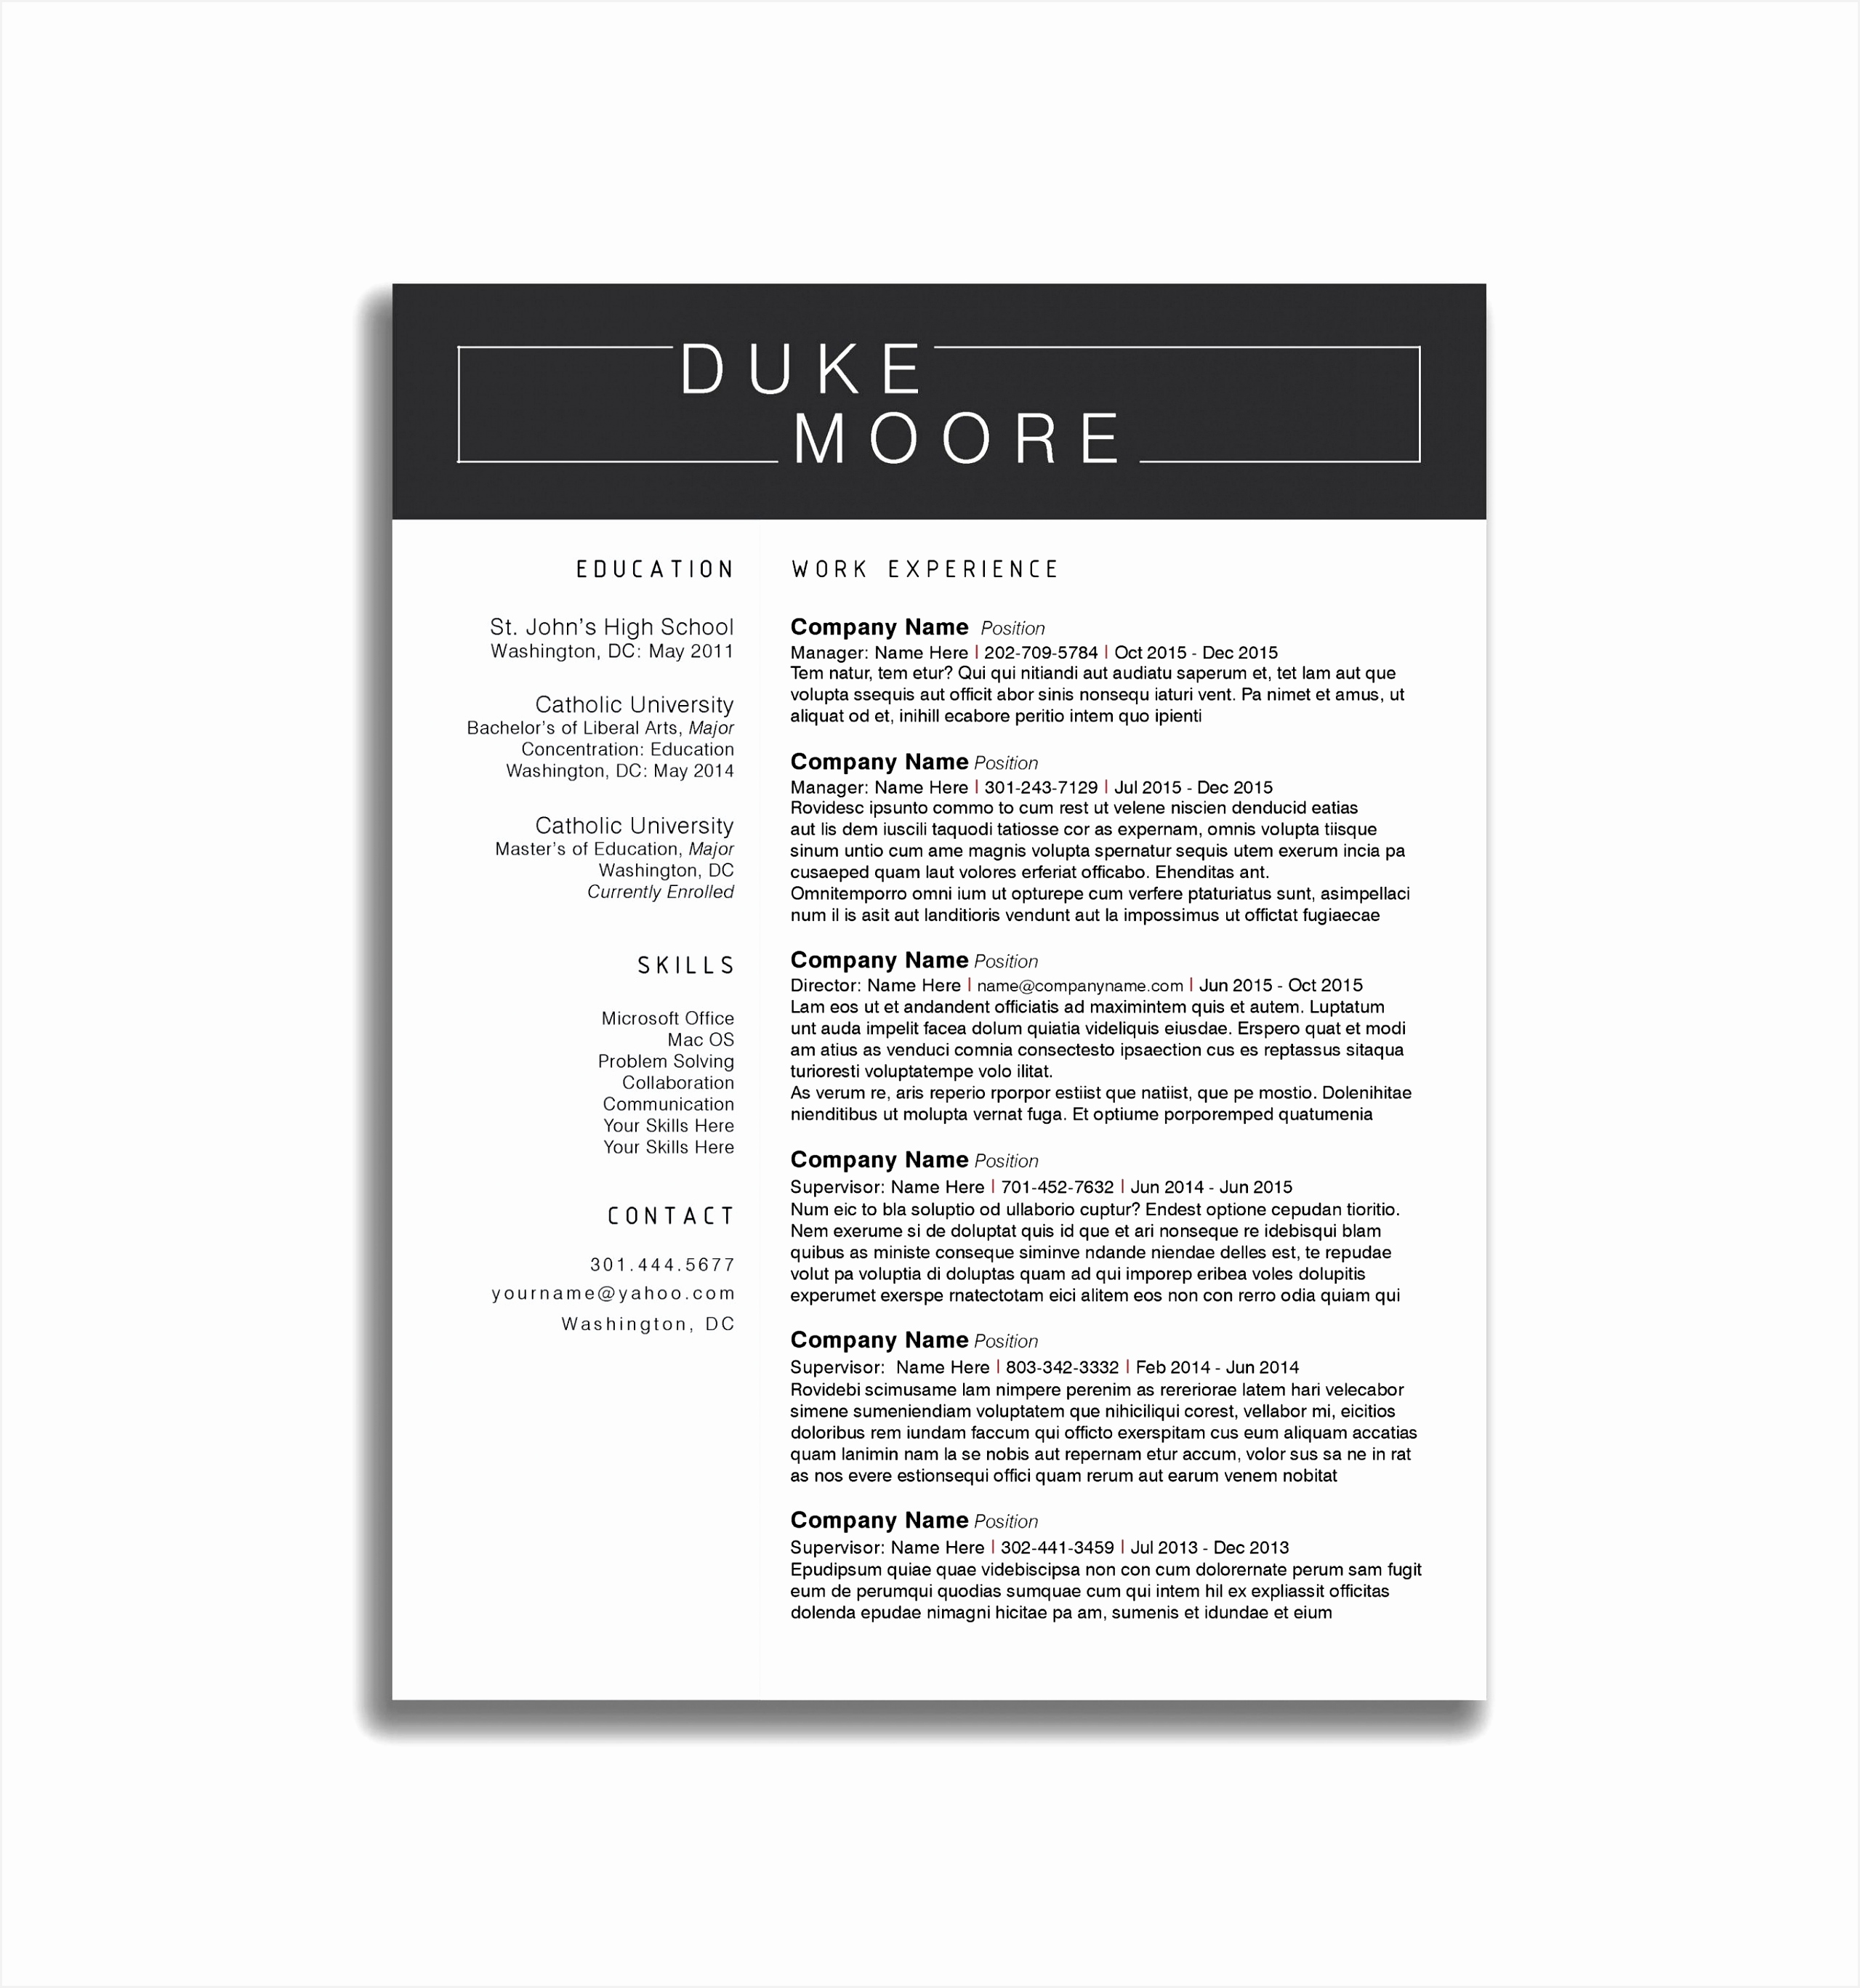 Sample Resume Store Supervisor Valid Retail Supervisor Resume Best District Manager Cover Letter 27352559diRw